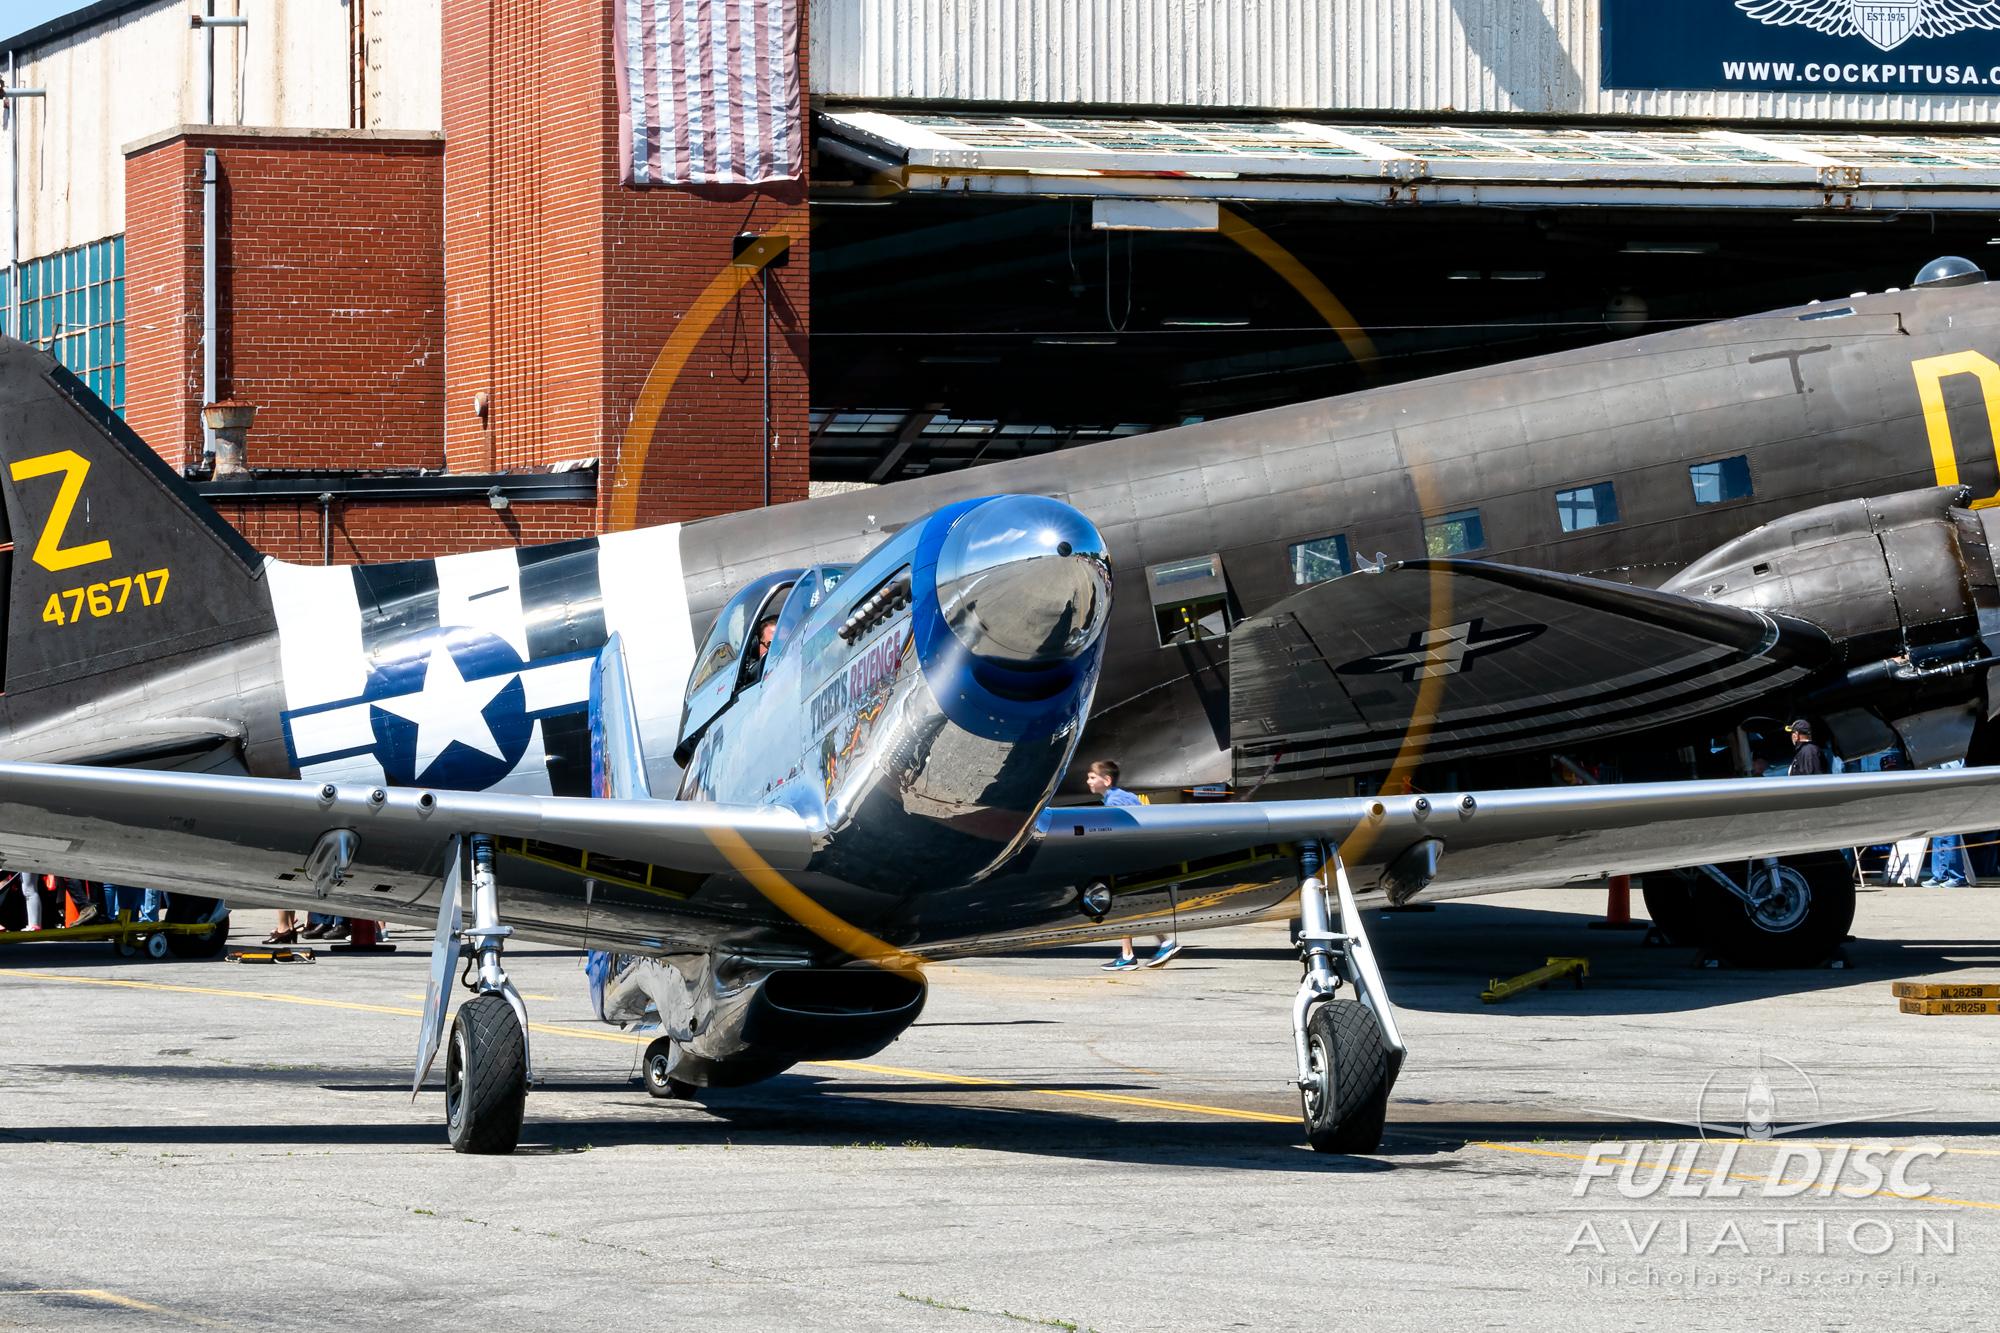 americanairpowermuseum_nicholaspascarella_nickpascarella_fulldiscaviation_legendsofairpower2019_aviation_warbird_mustang_idle_shiny_c47.jpg